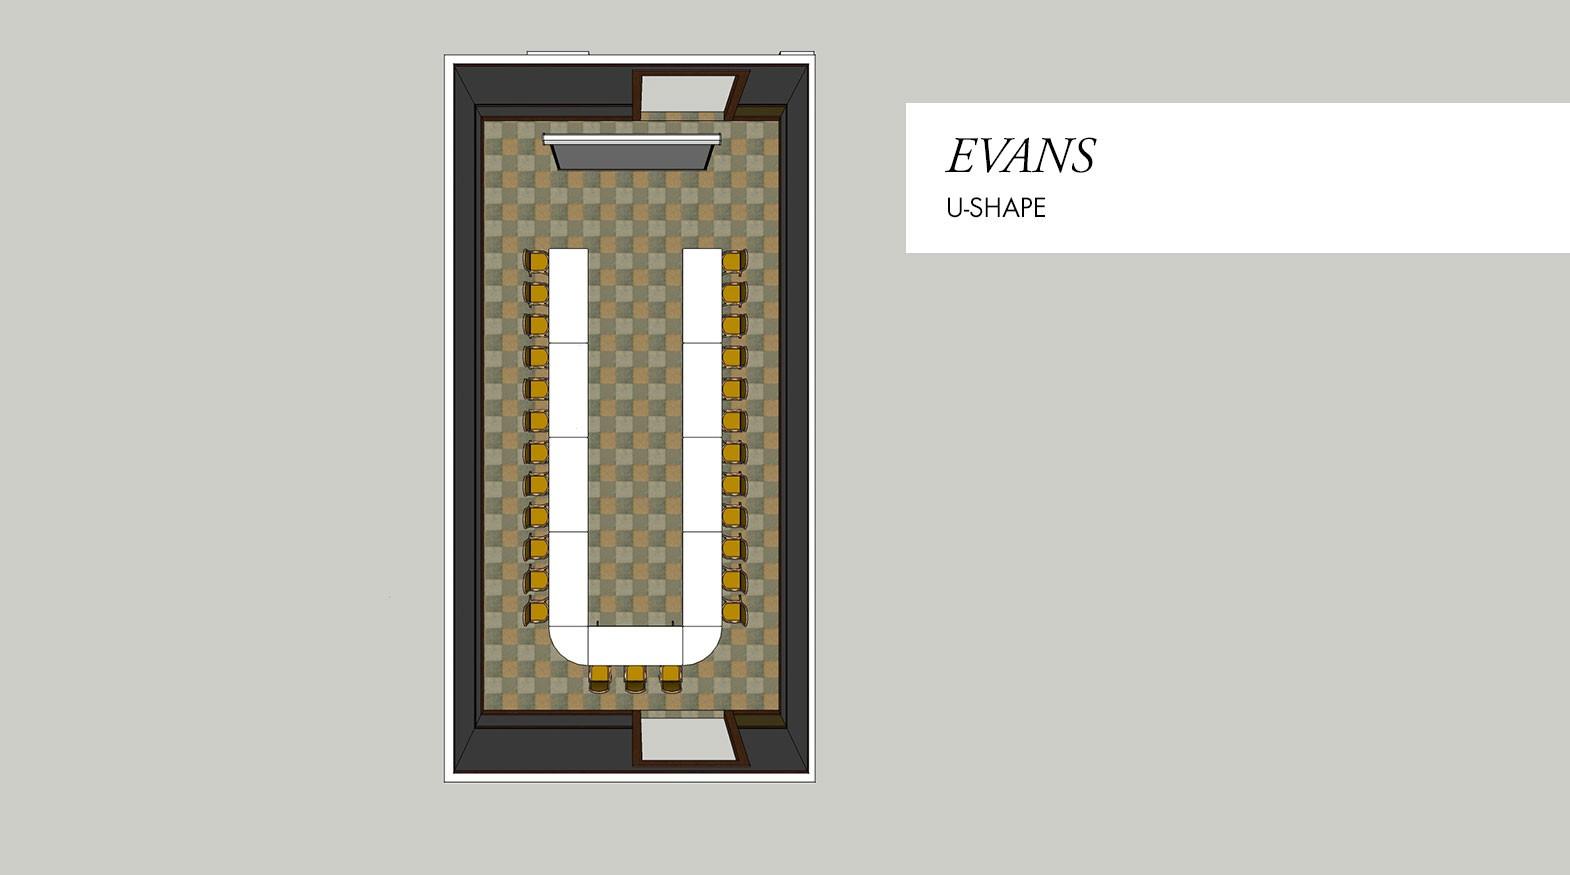 evans-u-shape.jpg